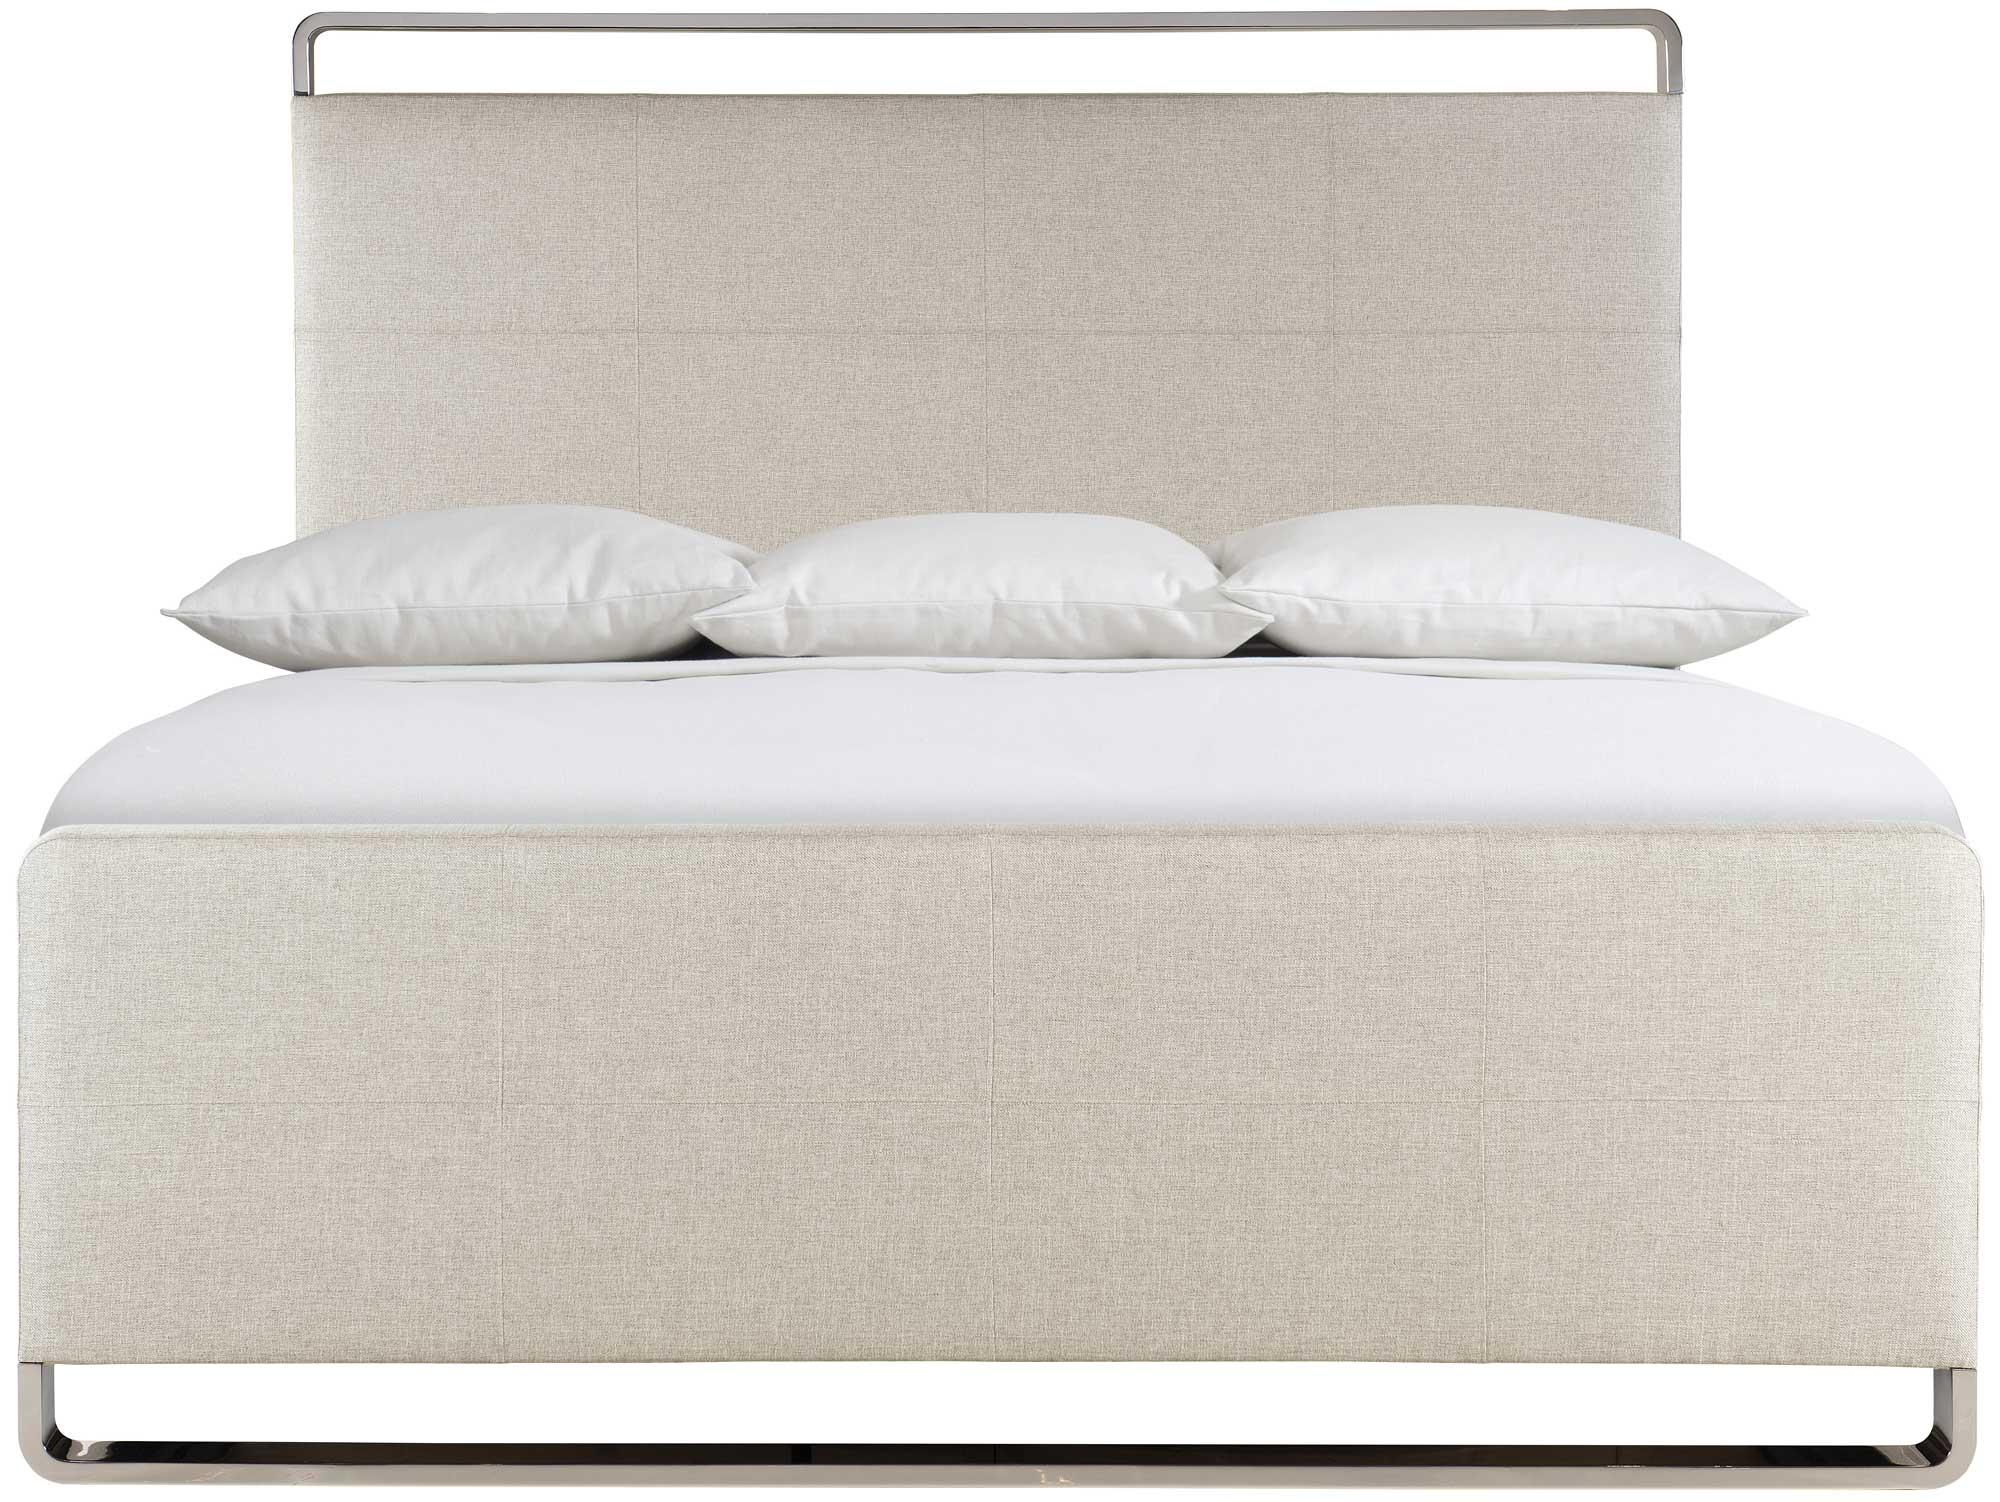 Interiors - Salena Panel Bed by Bernhardt at Stuckey Furniture